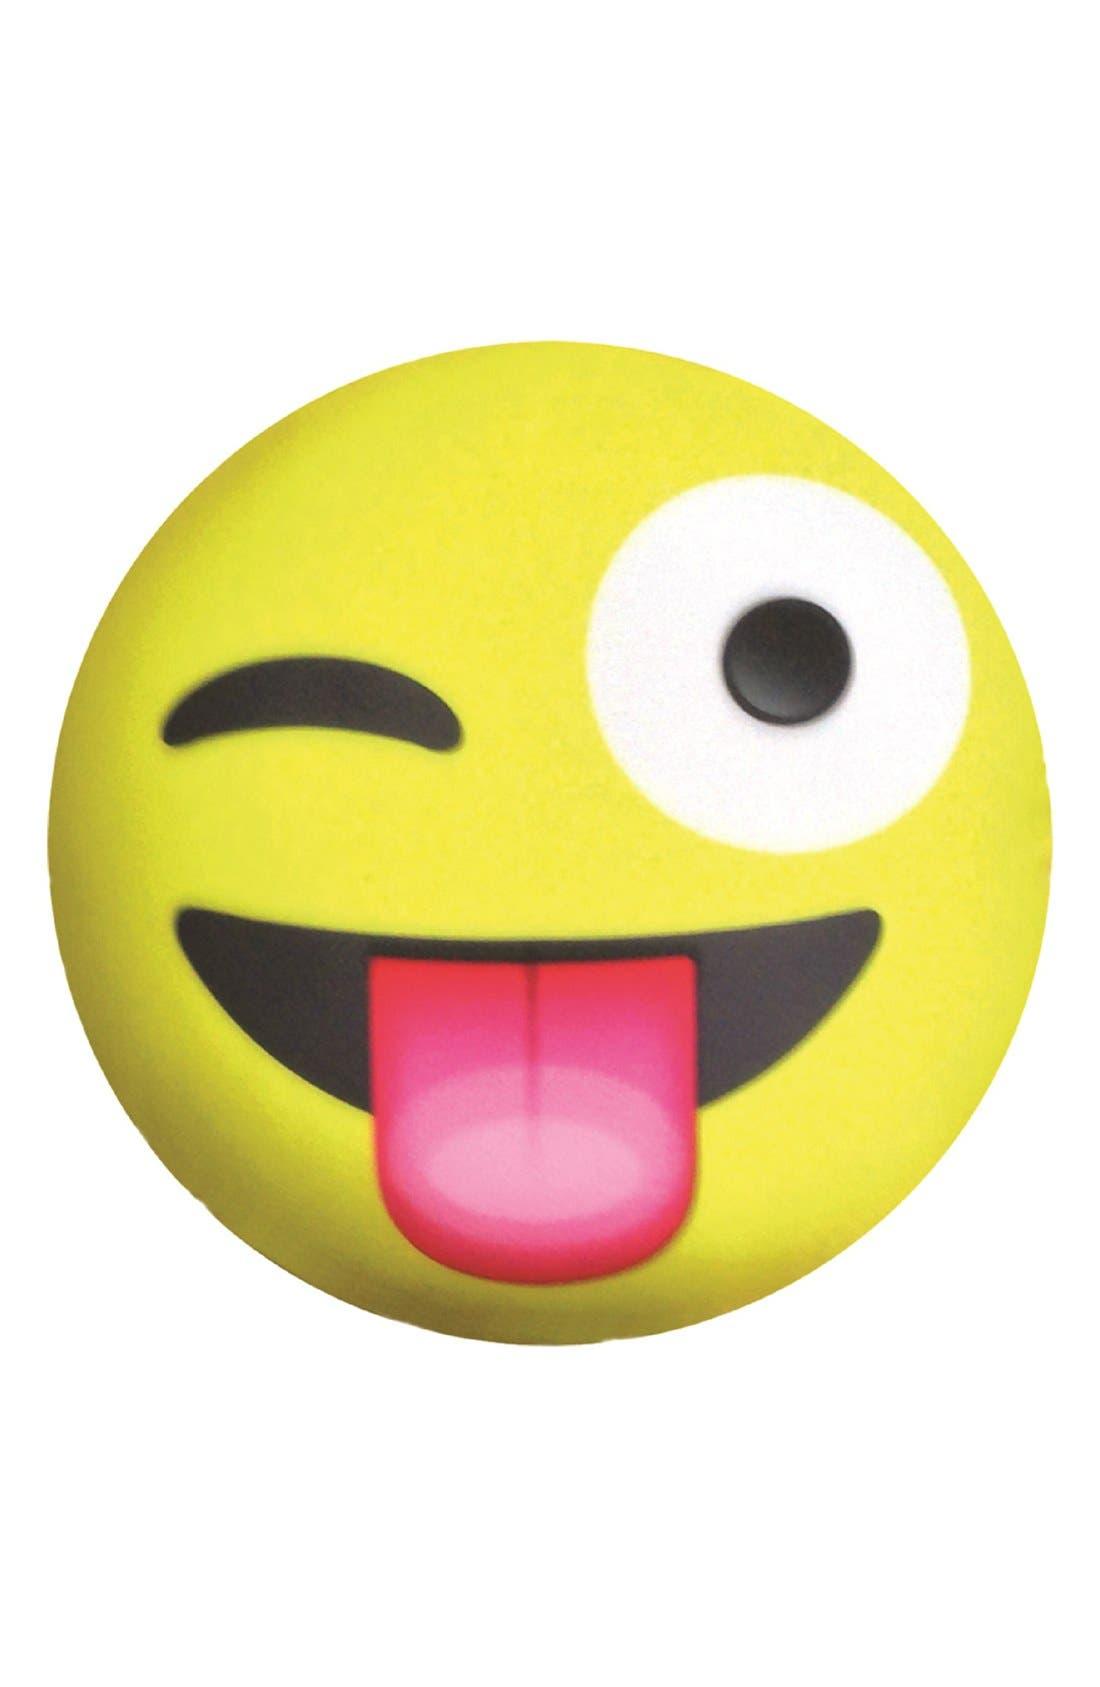 'Crazy Face' Emoji Pillow,                             Main thumbnail 1, color,                             700